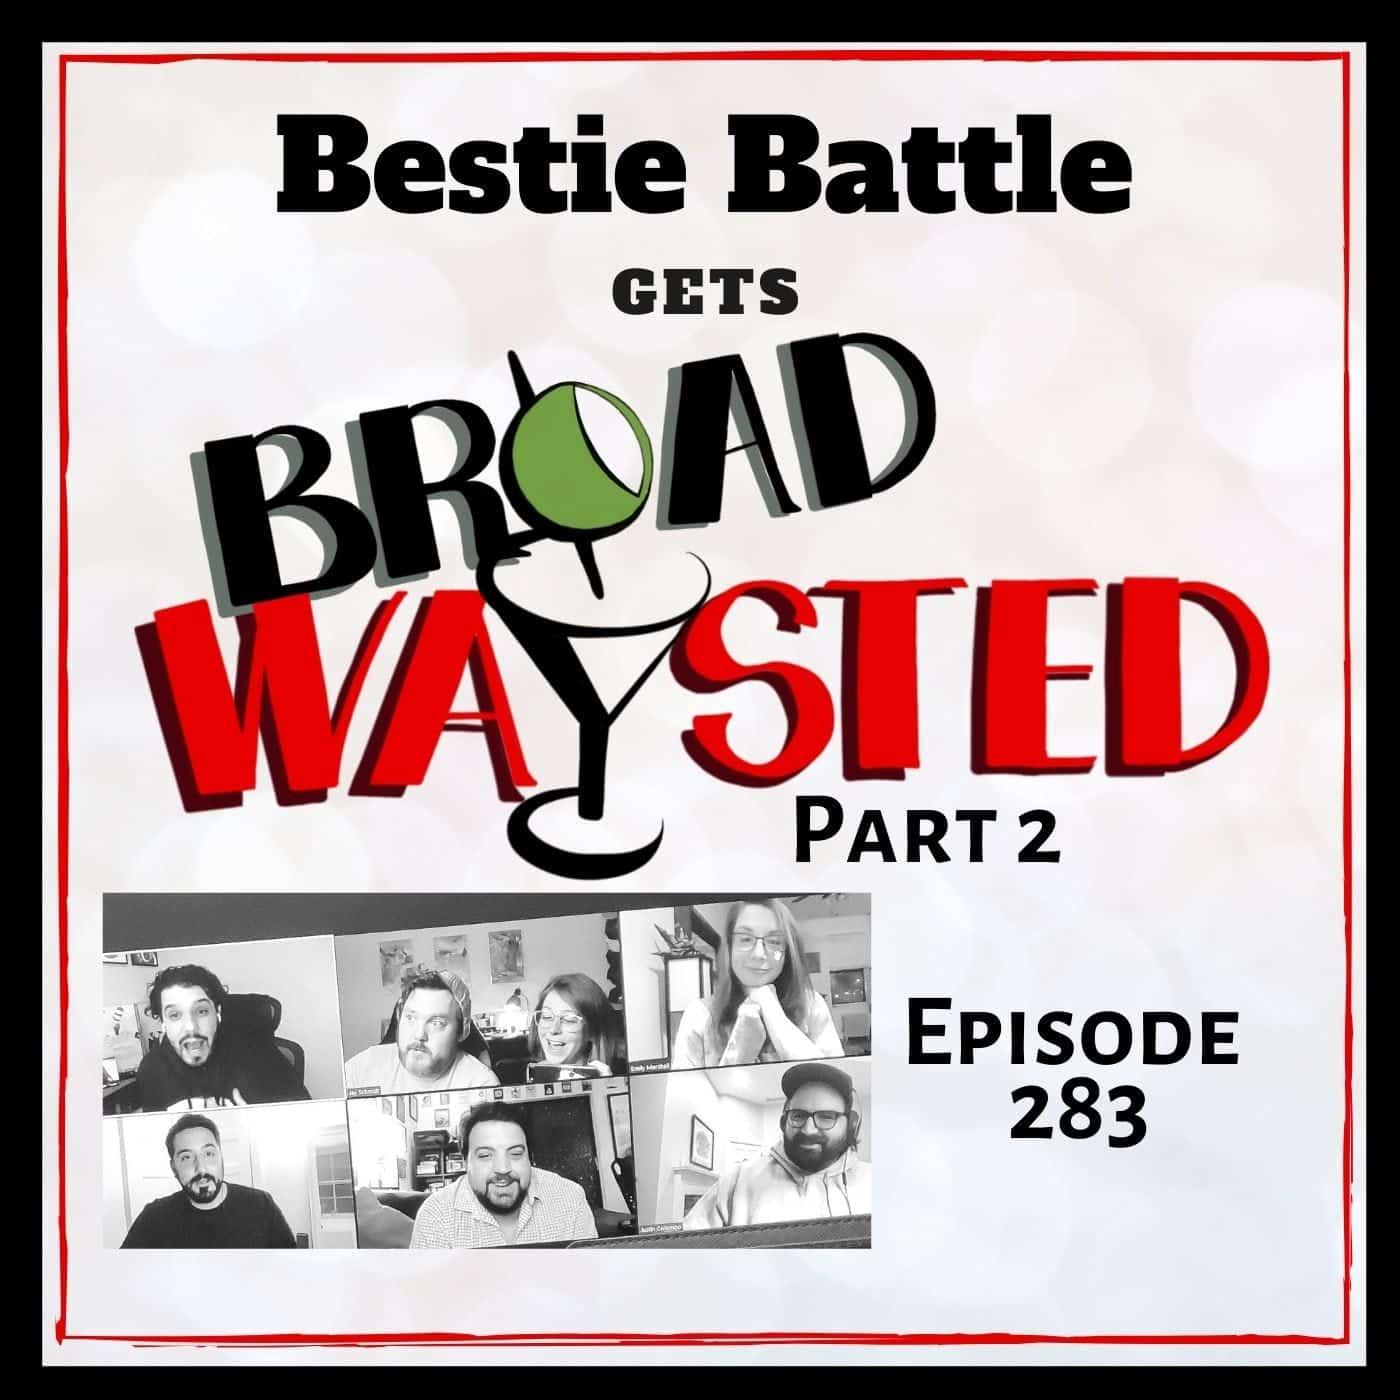 Episode 283: Bestie Battle gets Broadwaysted, Part 2!